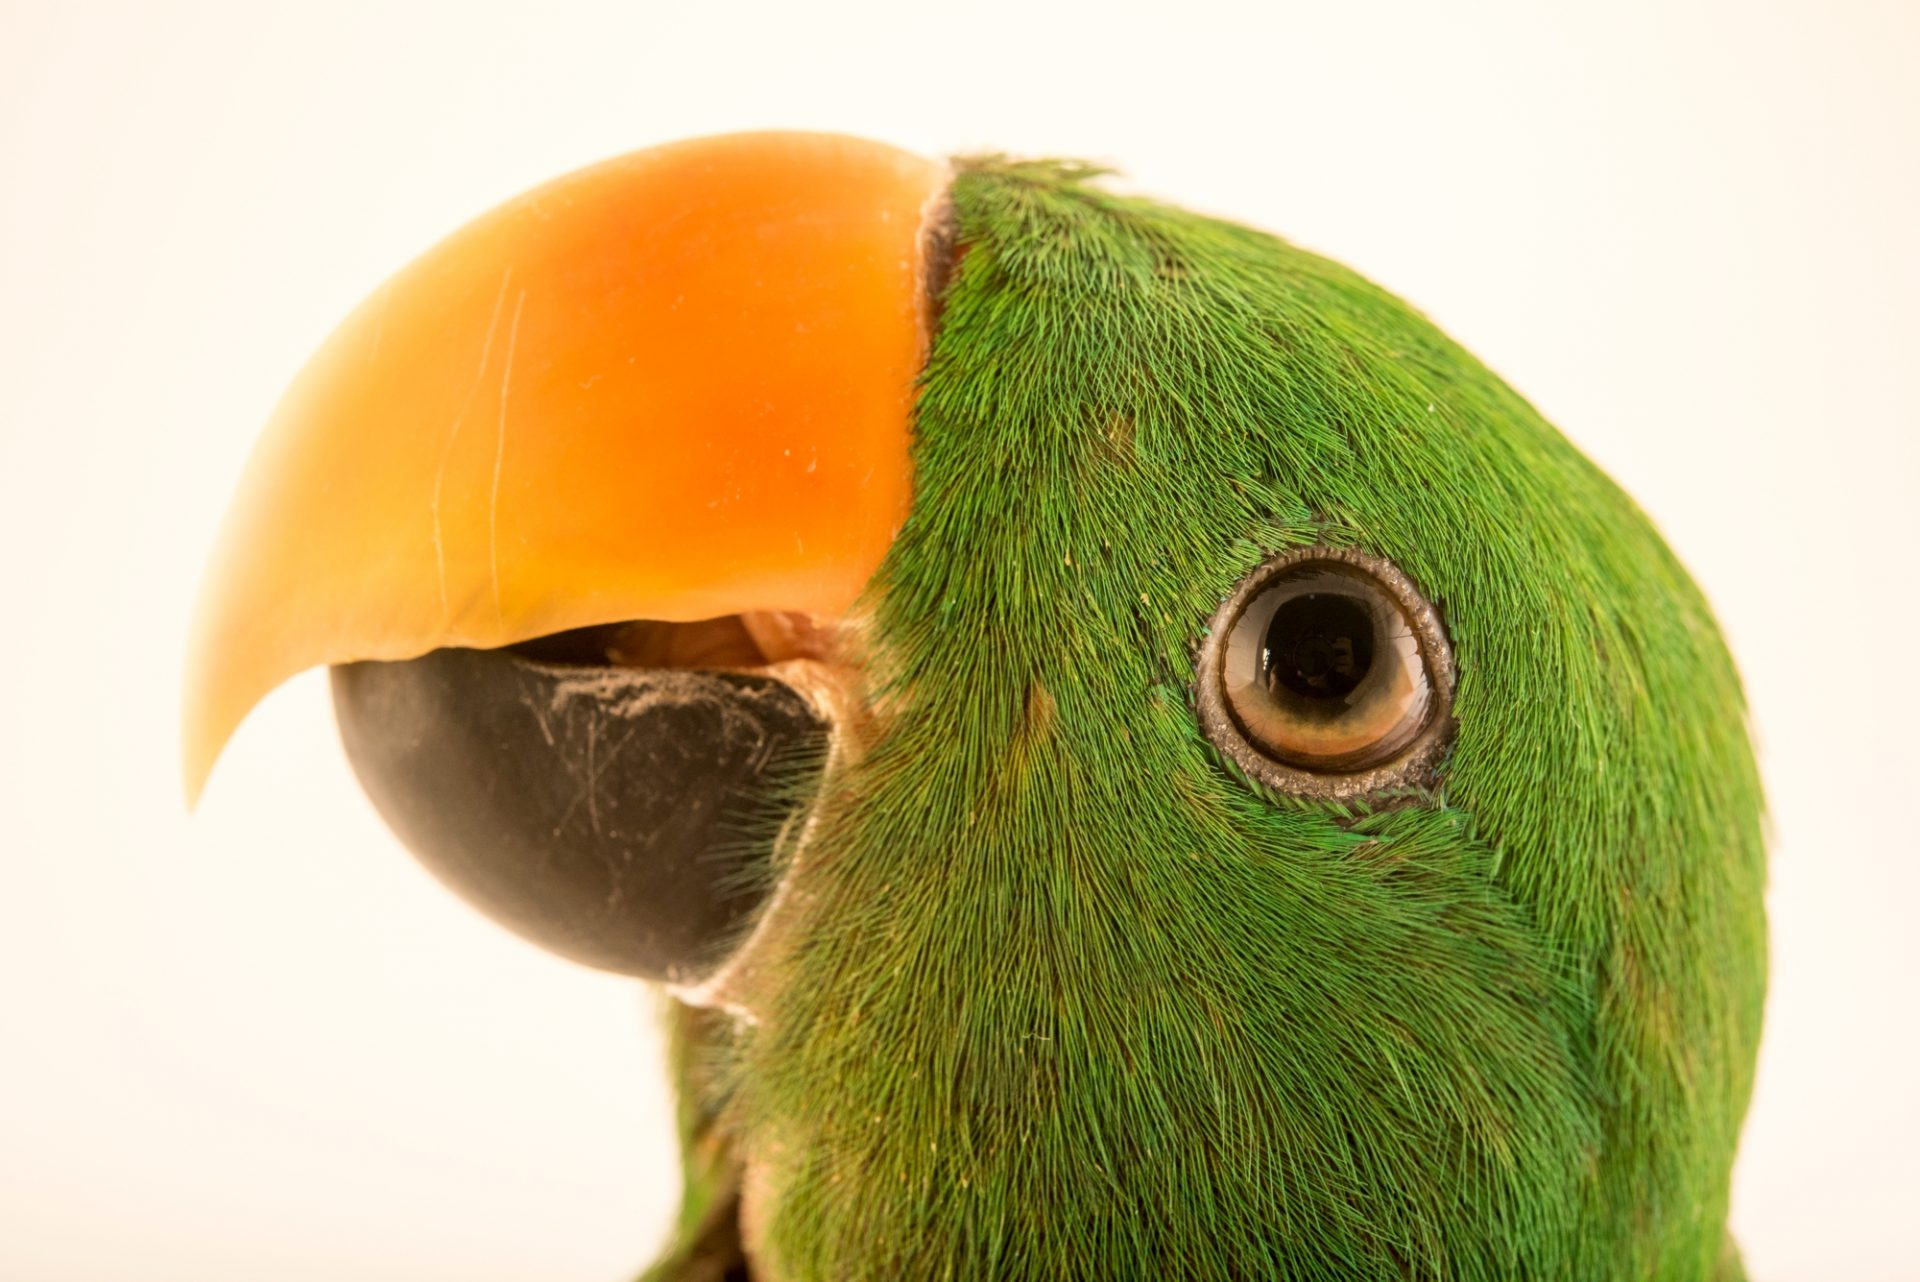 Photo: A male RiedelÕs eclectus parrot, Eclectus roratus riedeli, at Loro Parque Fundacion.